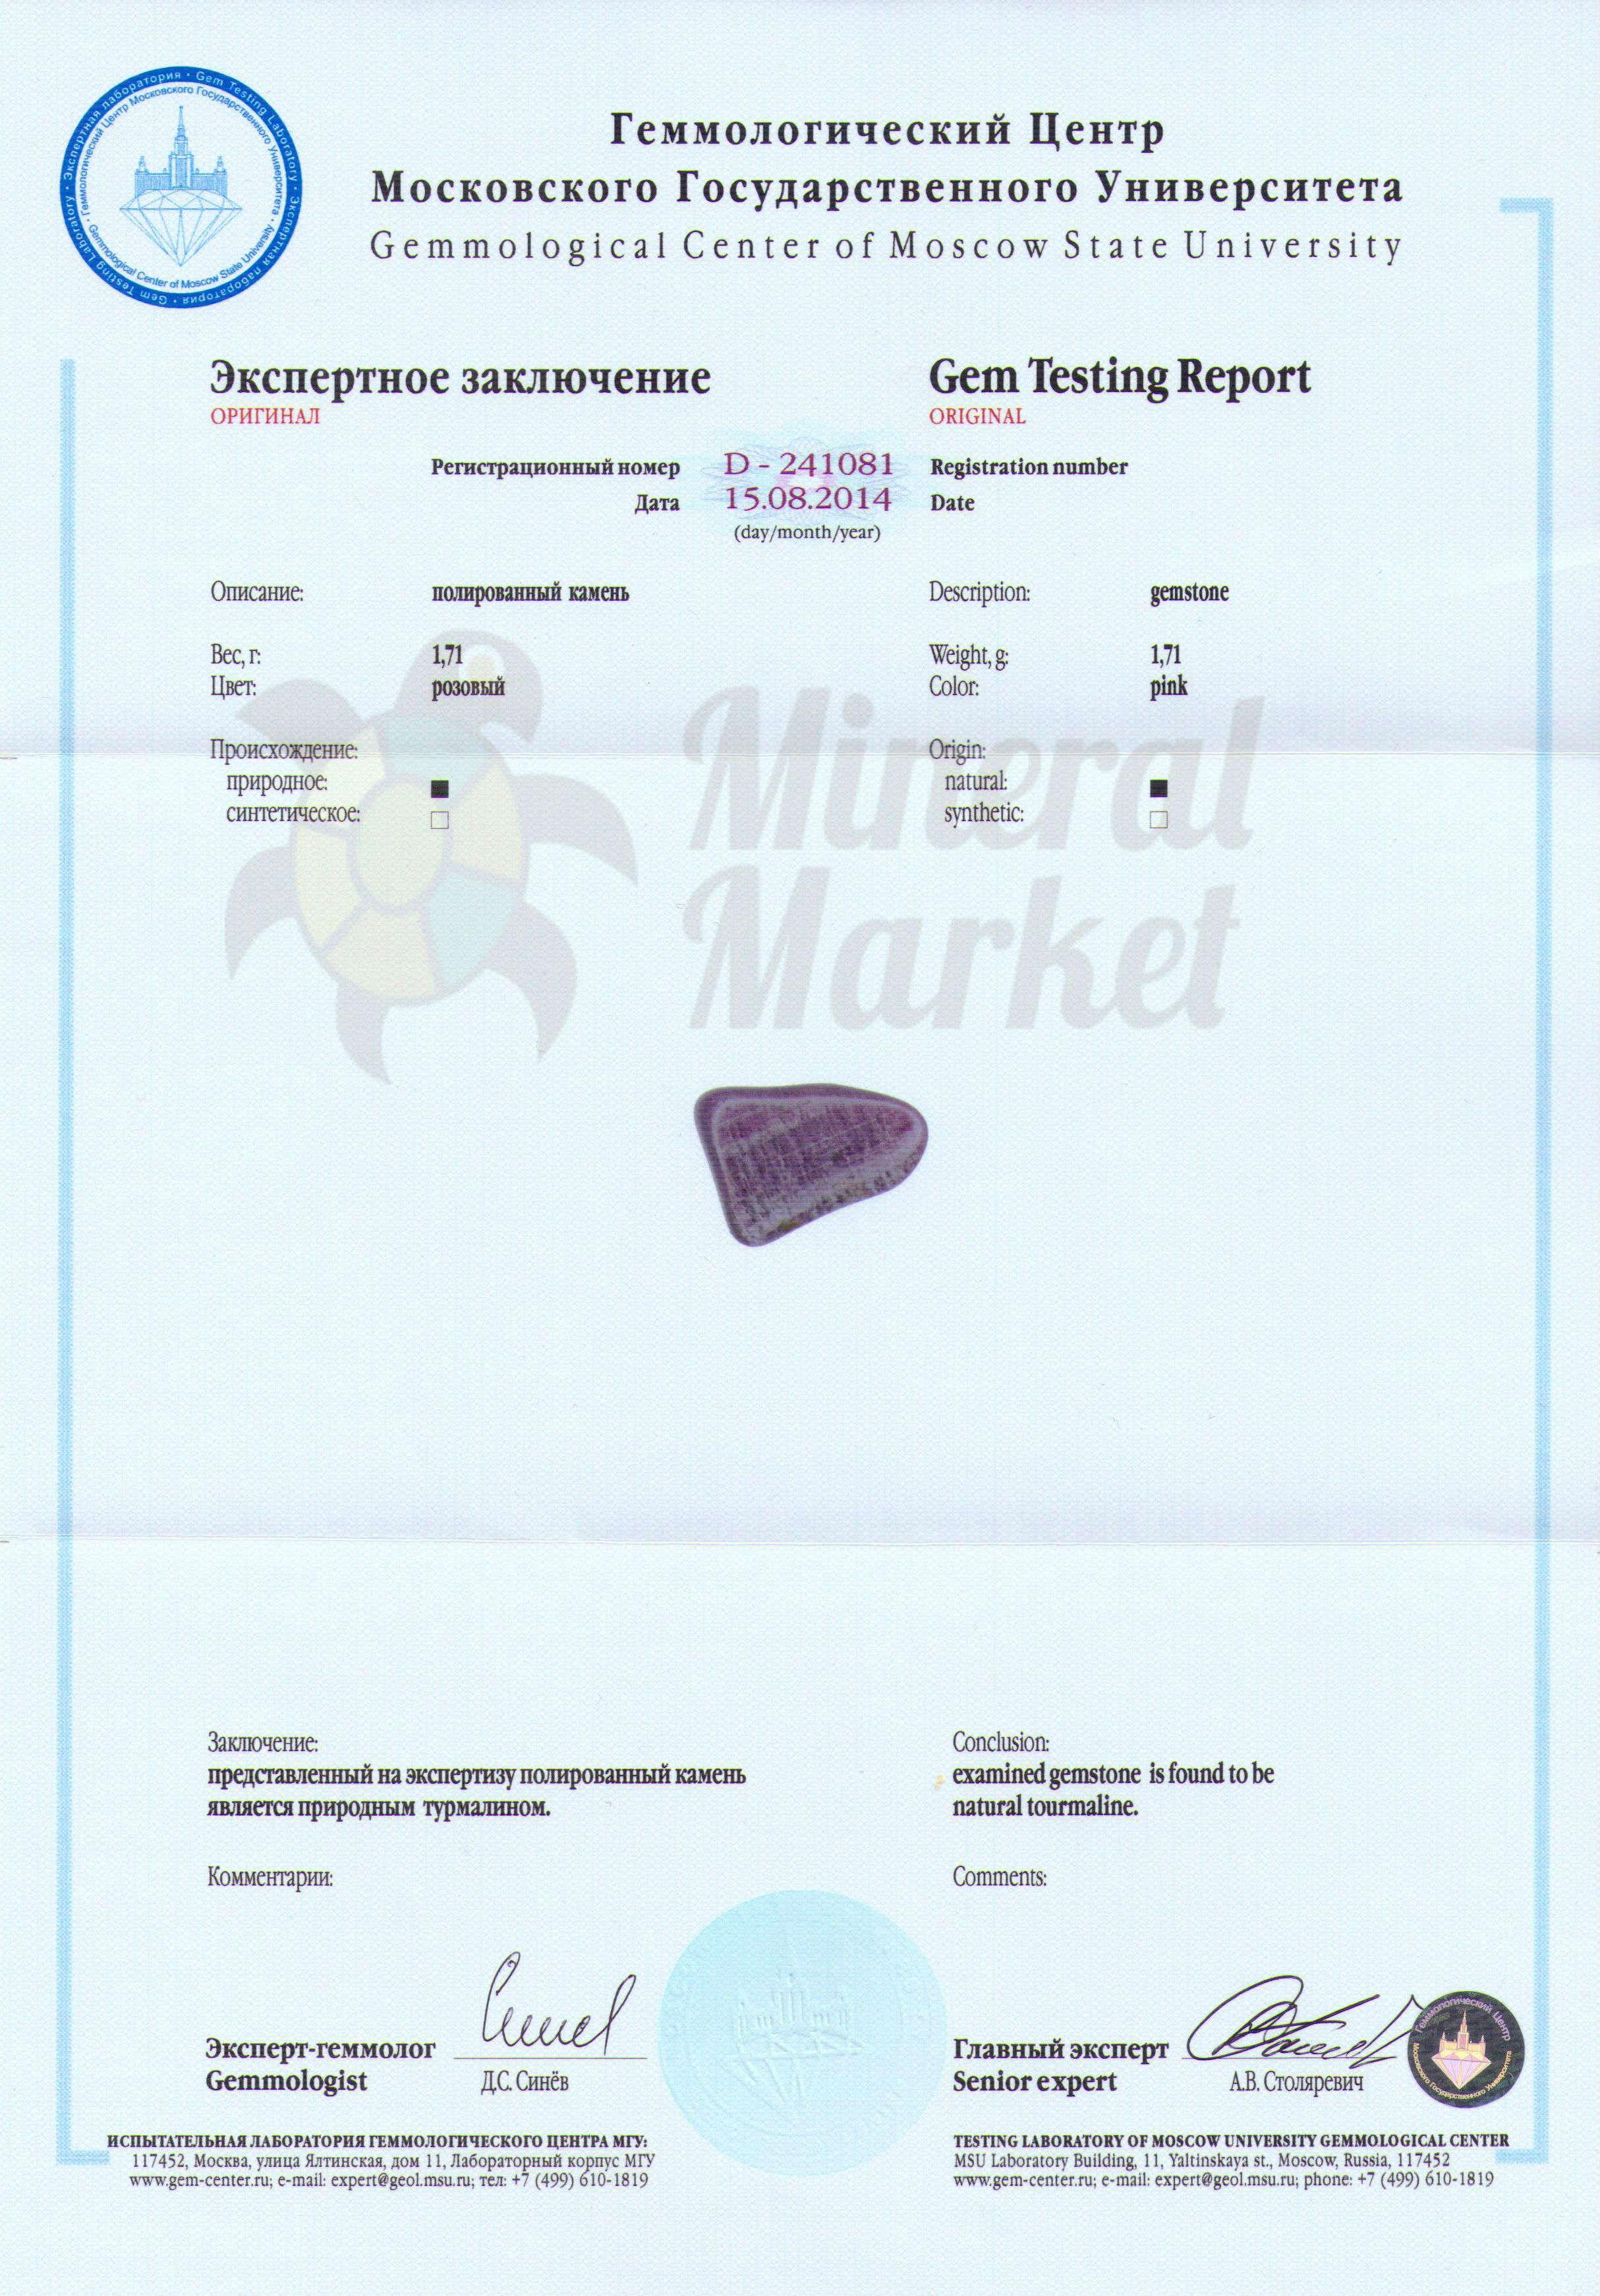 https://mineralmarket.ru/img/certificate/123/123.jpg